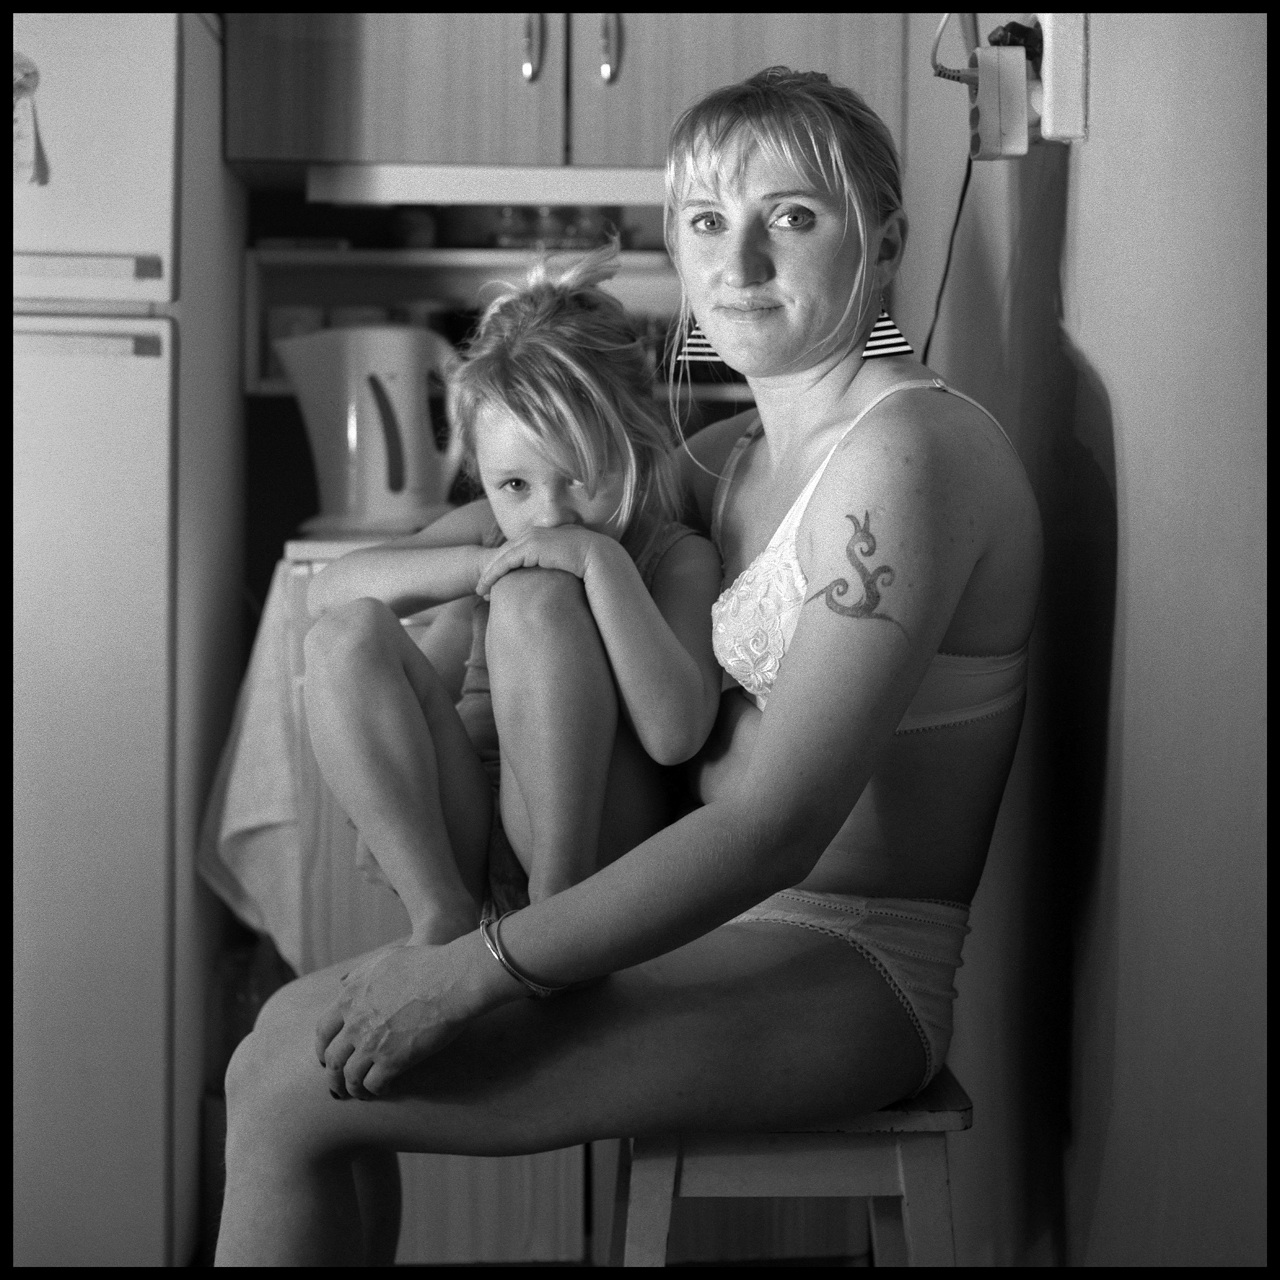 madres-ruido-photo-02-una-mama-novata